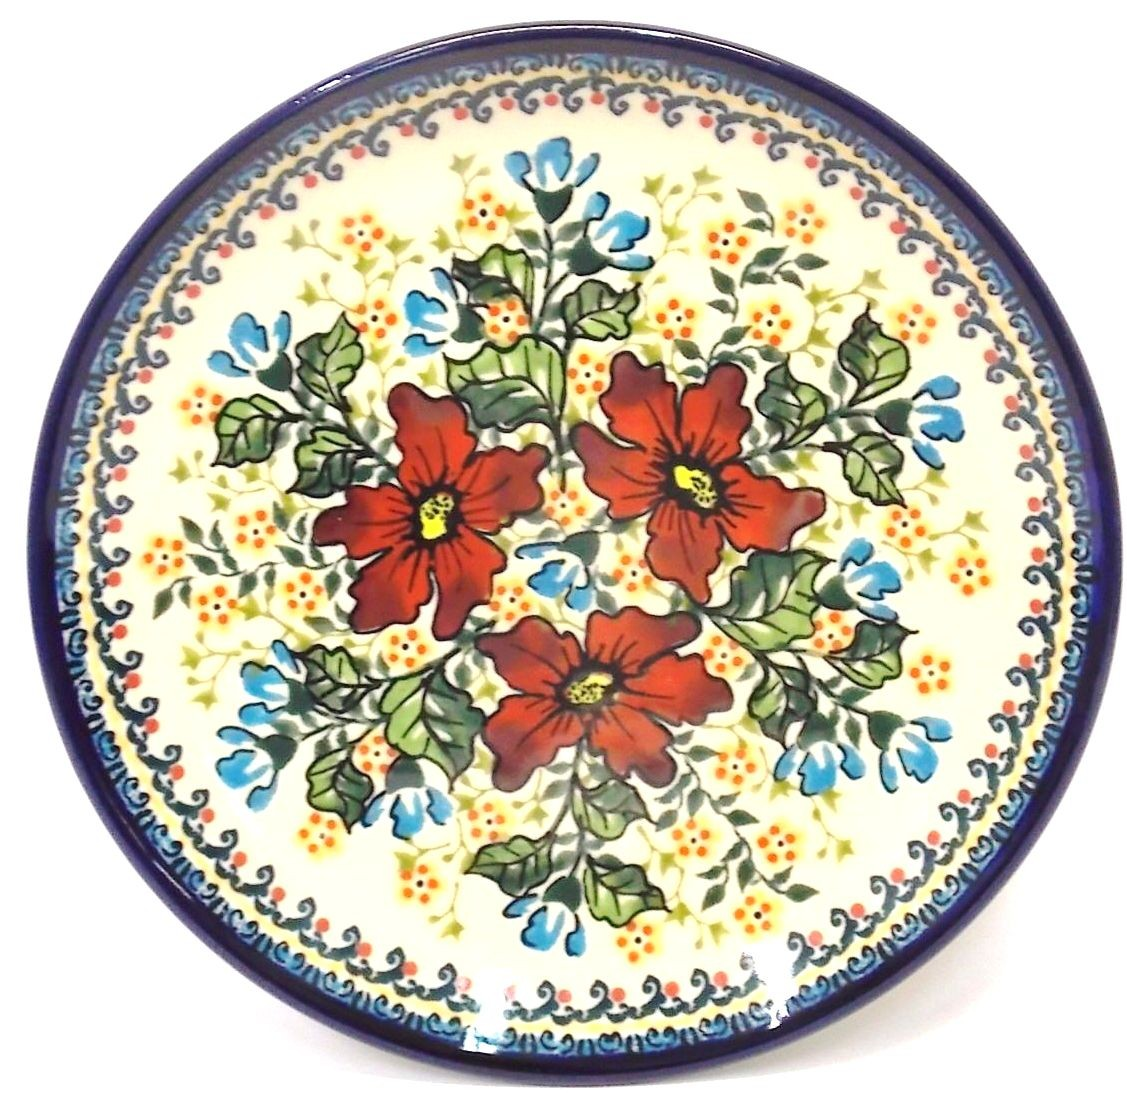 "Pottery Avenue 7.75"" Stoneware Salad-Luncheon Plate - 814-317EX Warm Glory"